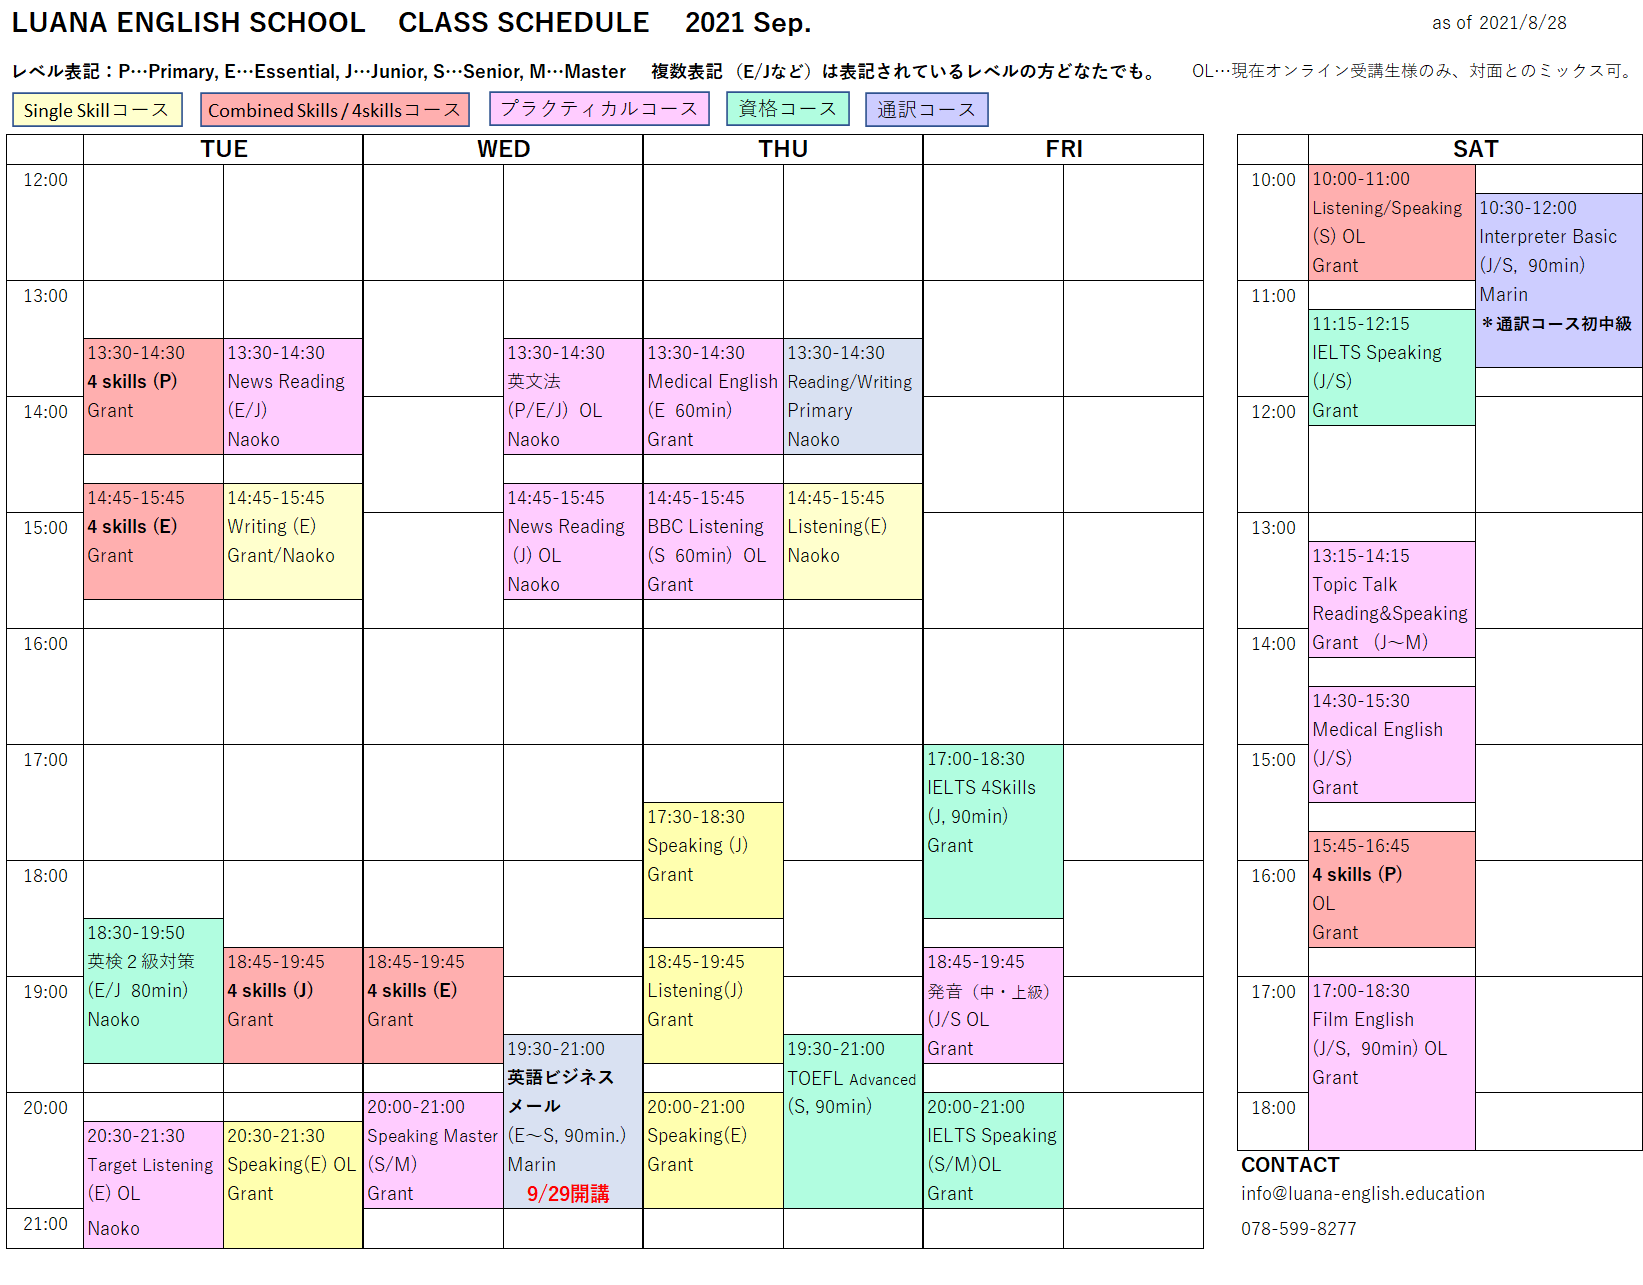 LUANA ENGLISH SCHOOL CLASS SCHEDULE  Sep..png